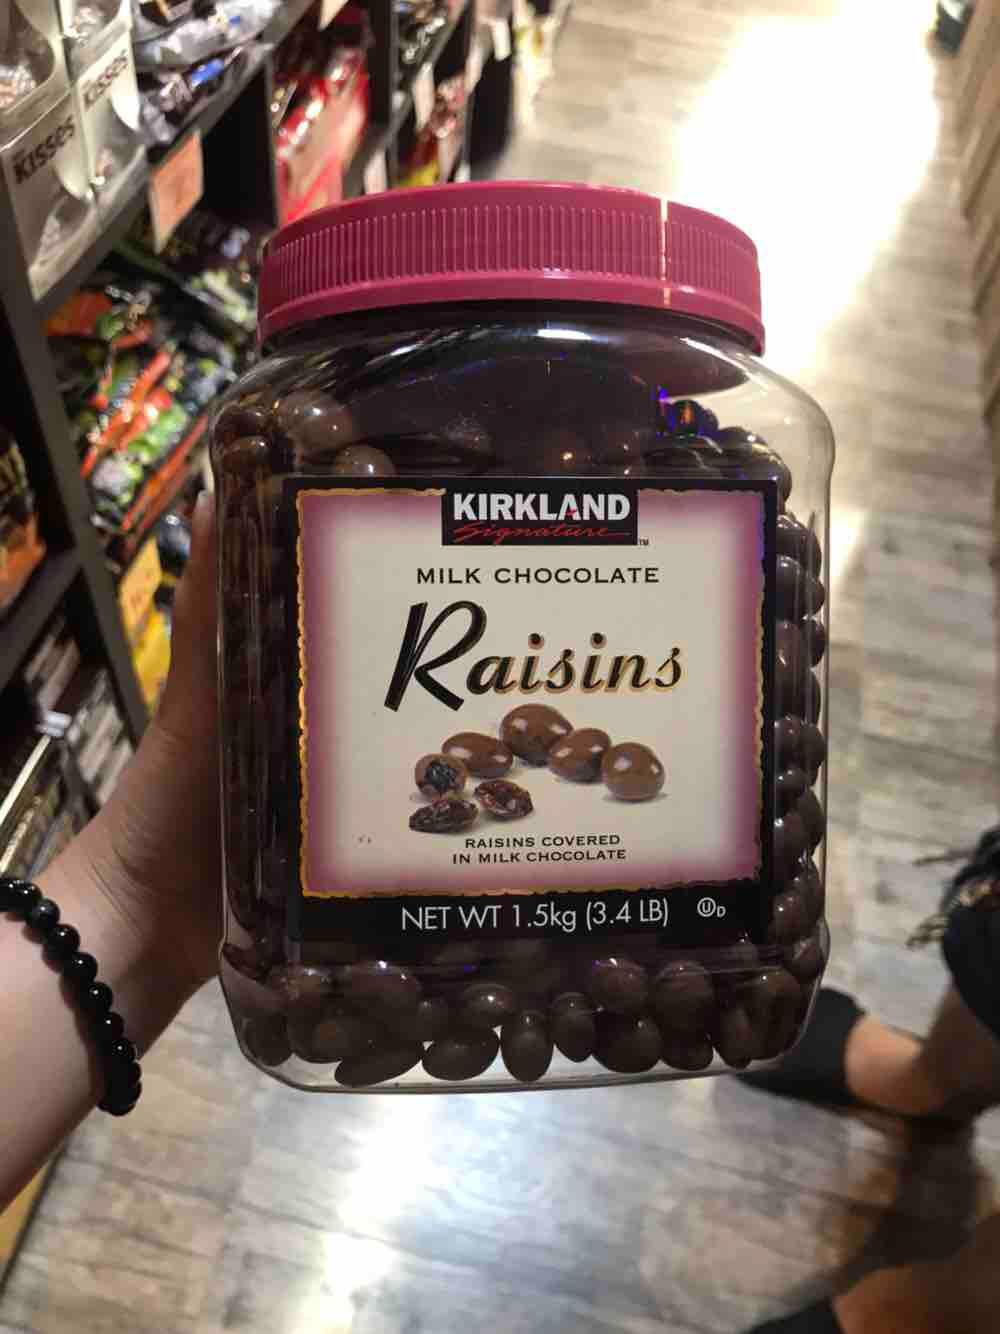 Kirkland Raisins 1 5kg